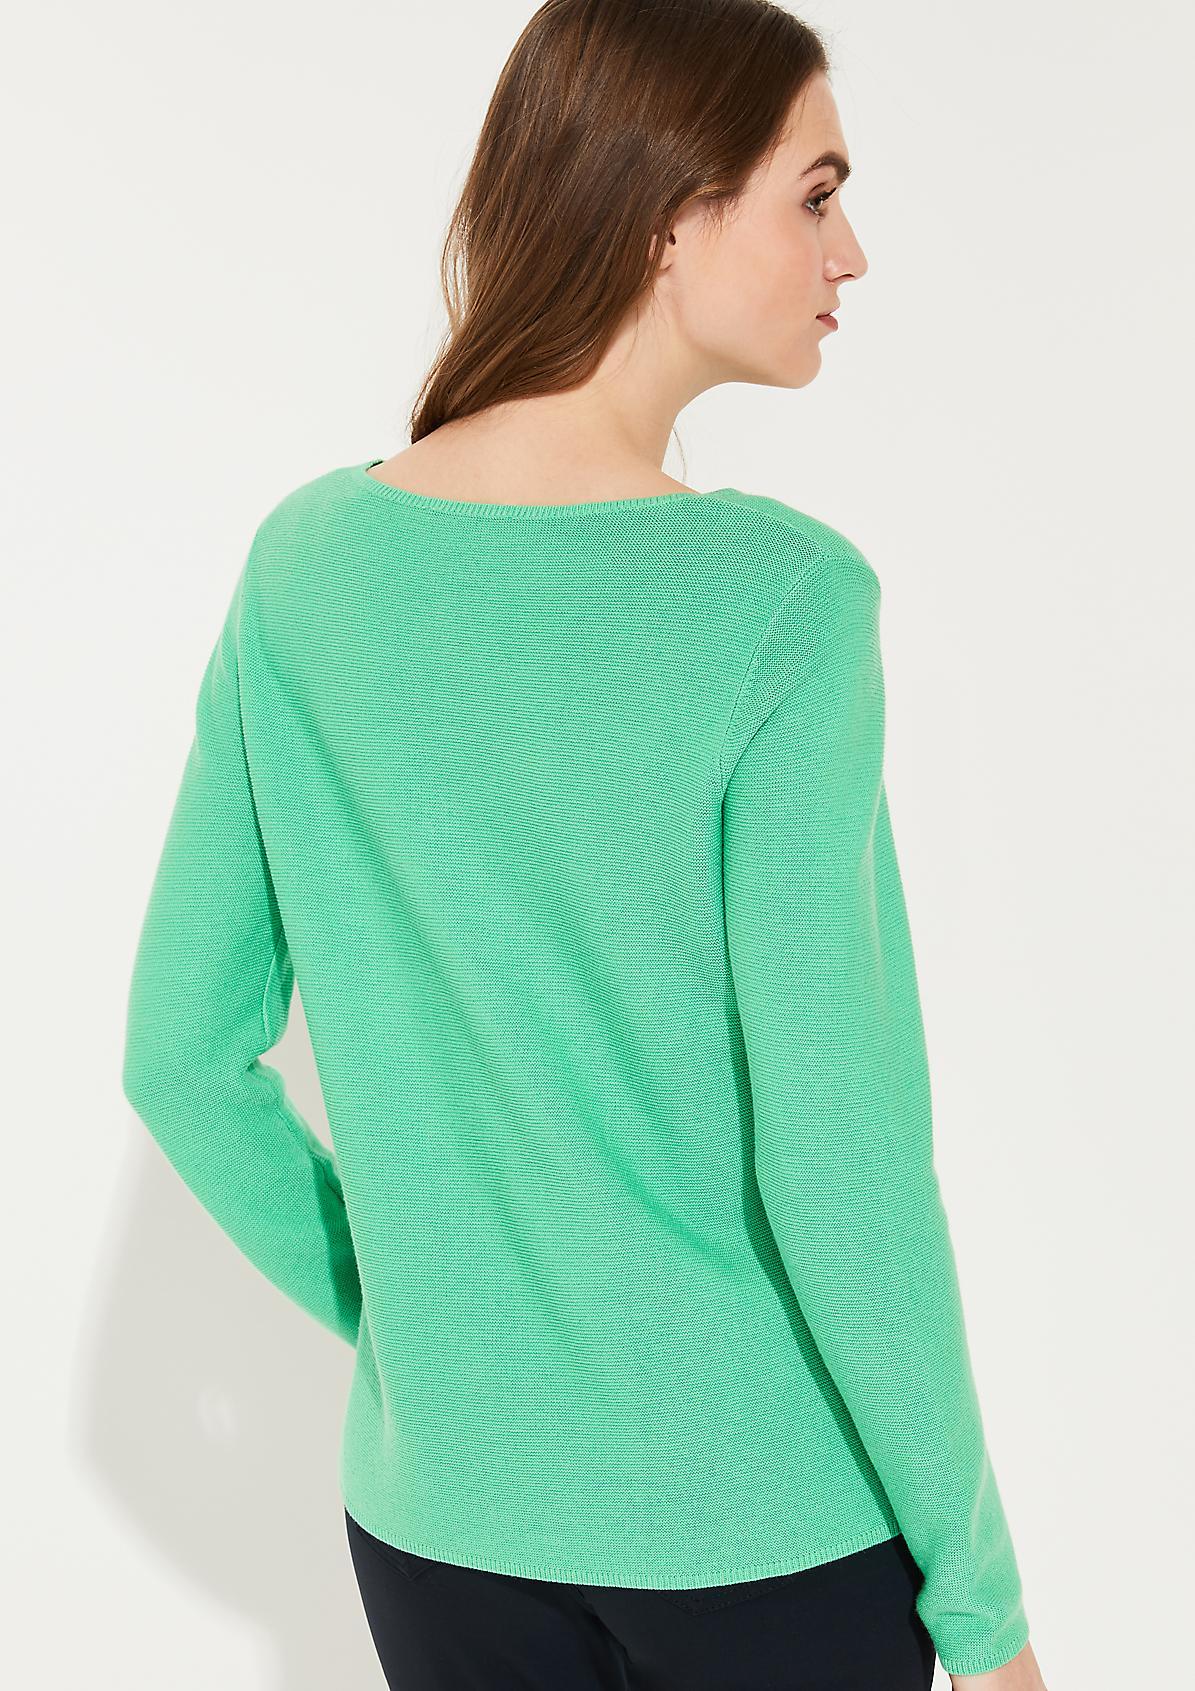 Leichter Feinstrick-Pullover